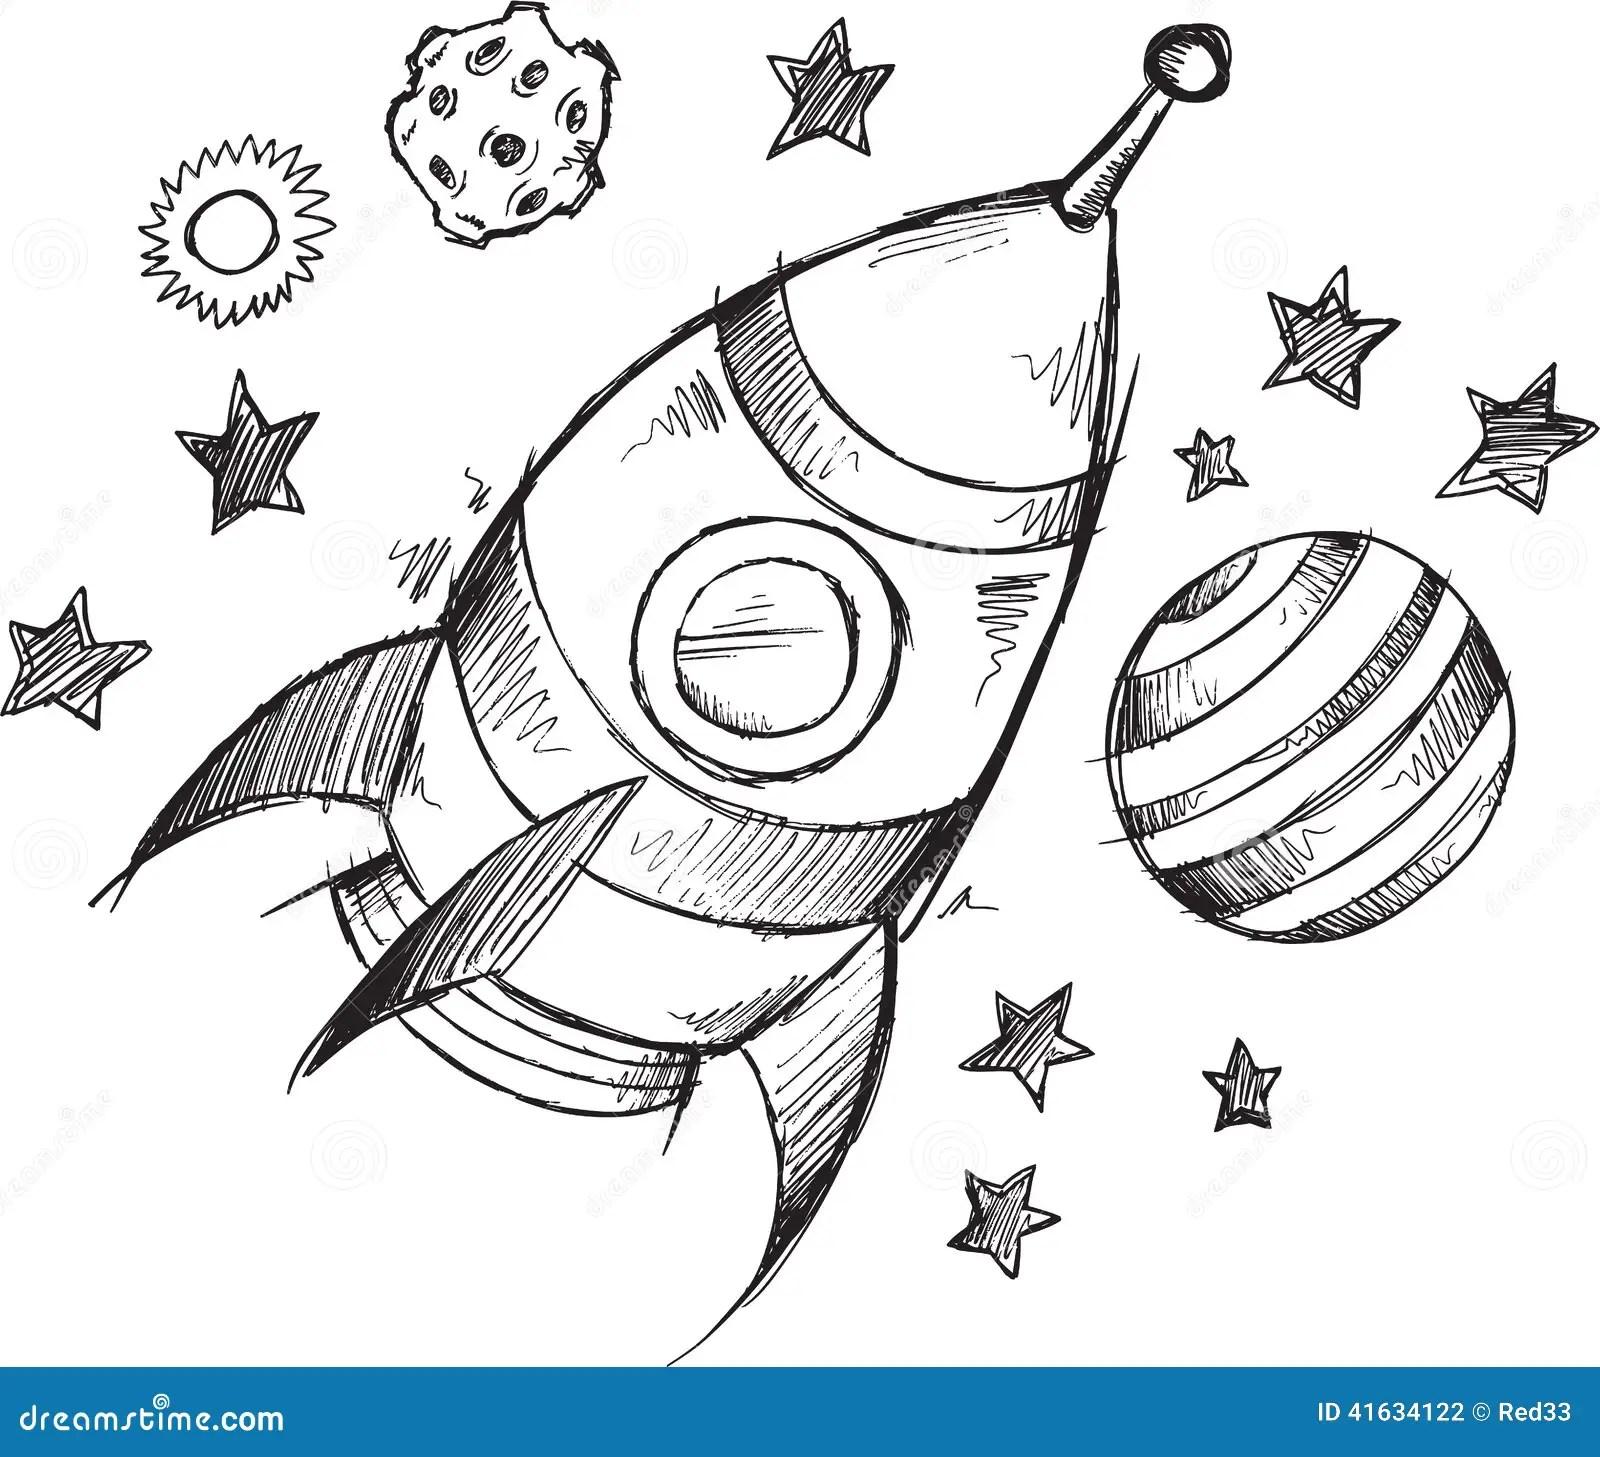 Rocket Space Doodle Sketch Vector Vector Illustratie